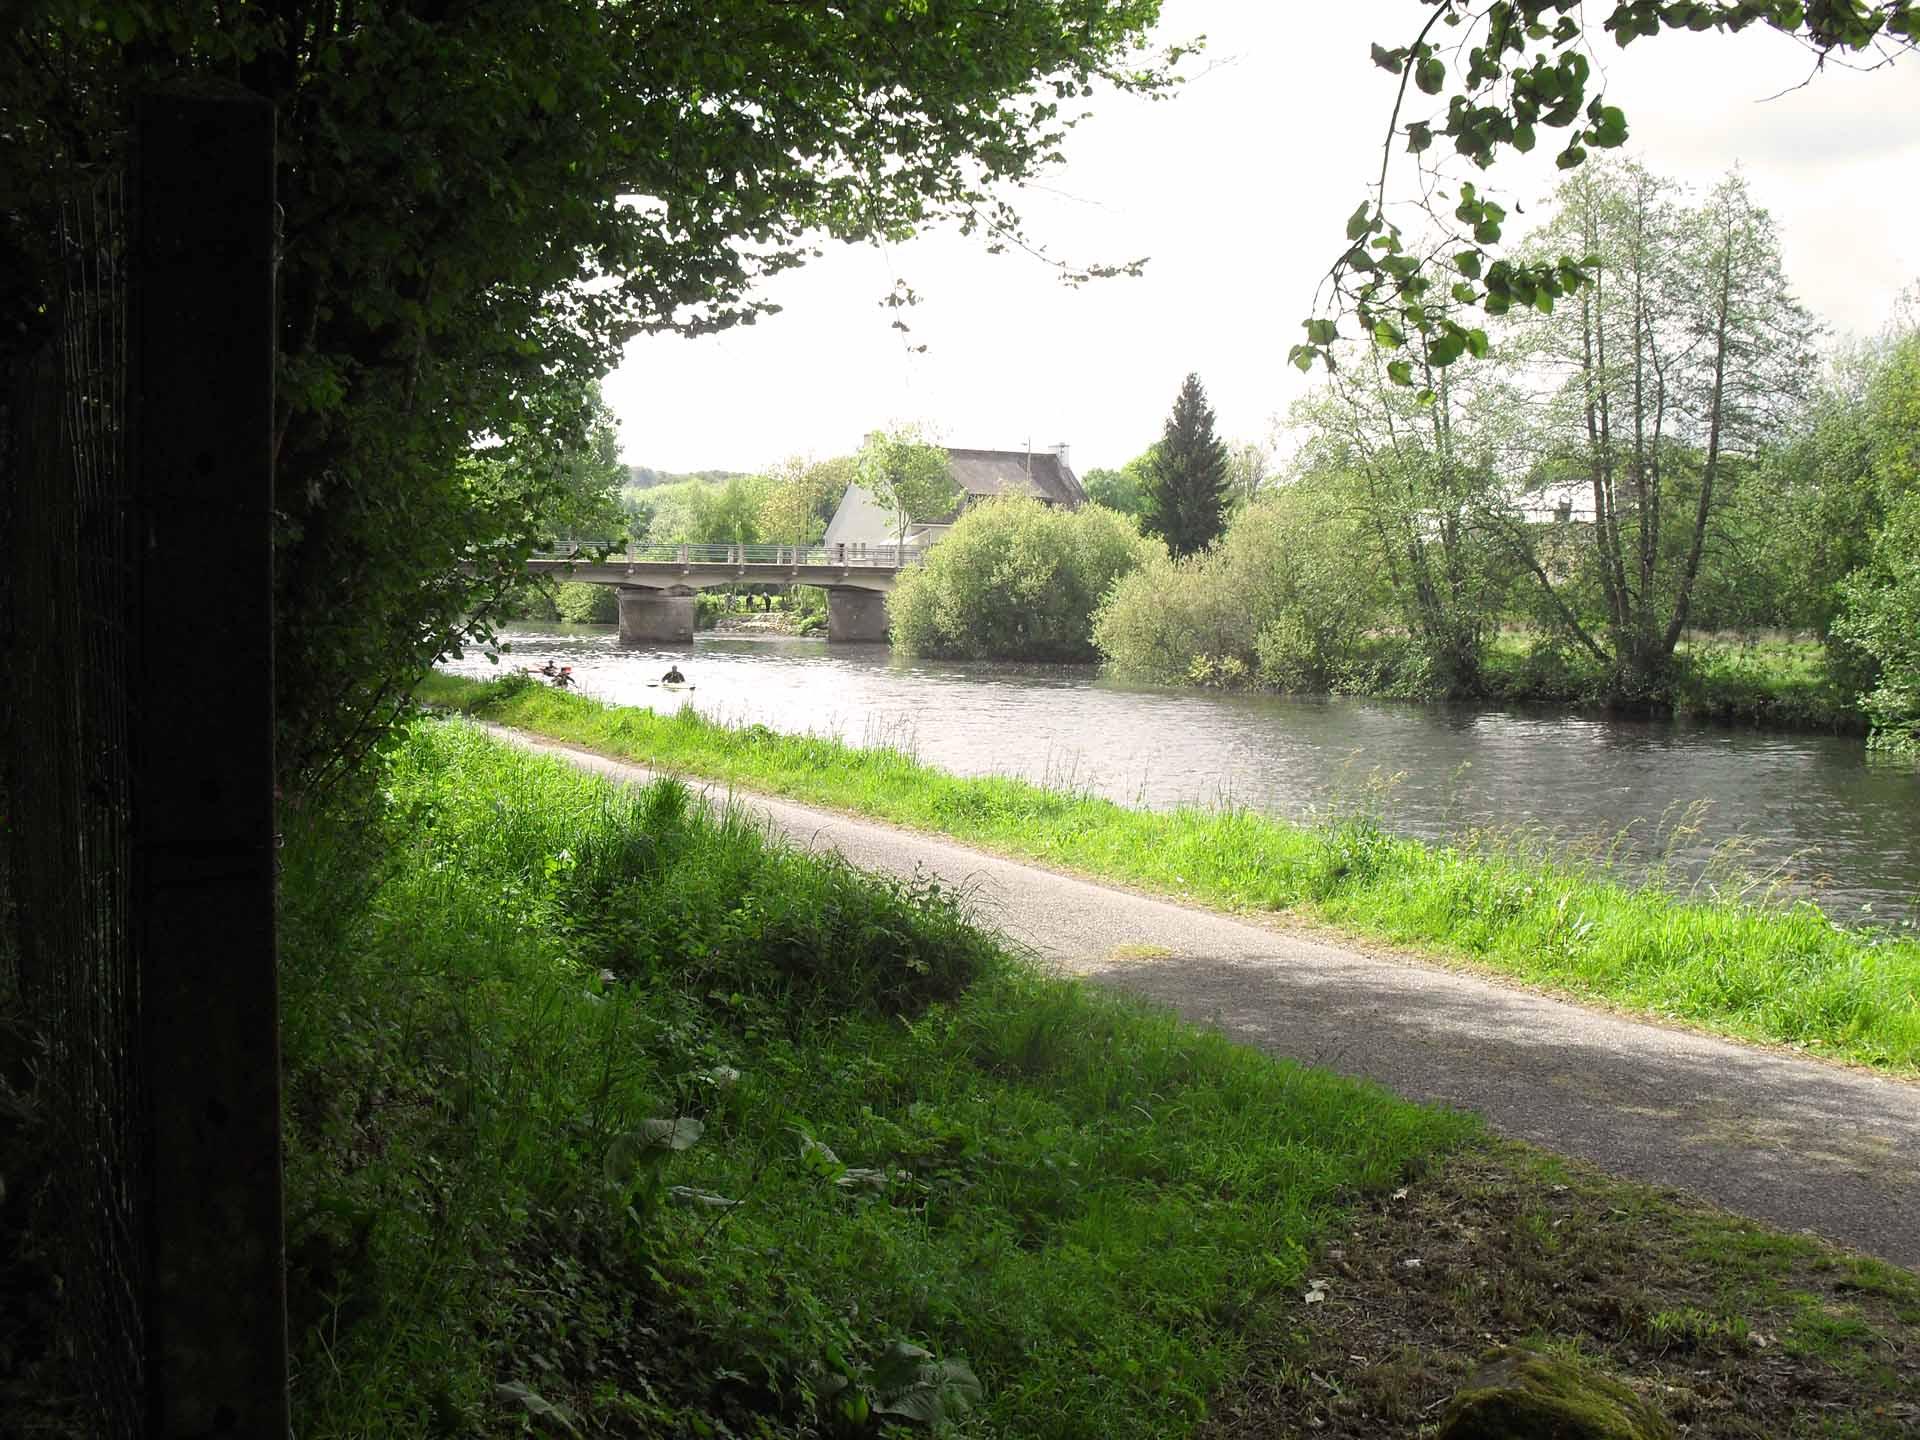 Le camping est proche hallage du Blavet - Camping de Pont Augan - Languidic - Morbihan